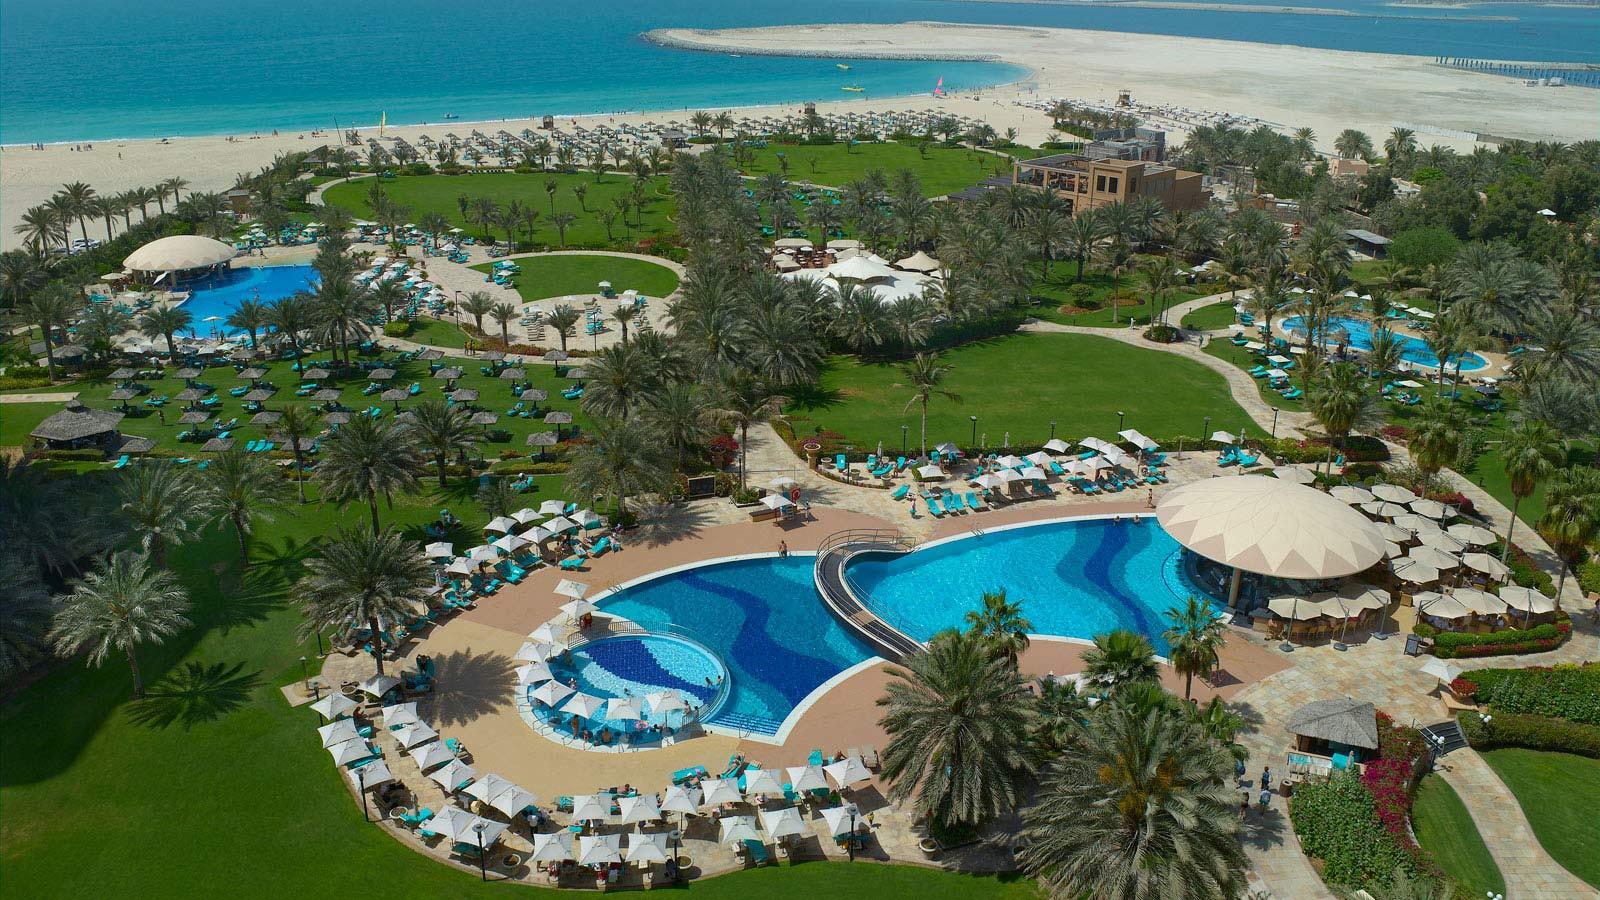 ОАЭ, Дубай, Джумейра LE ROYAL MERIDIEN BEACH RESORT & SPA 5* 120300руб.